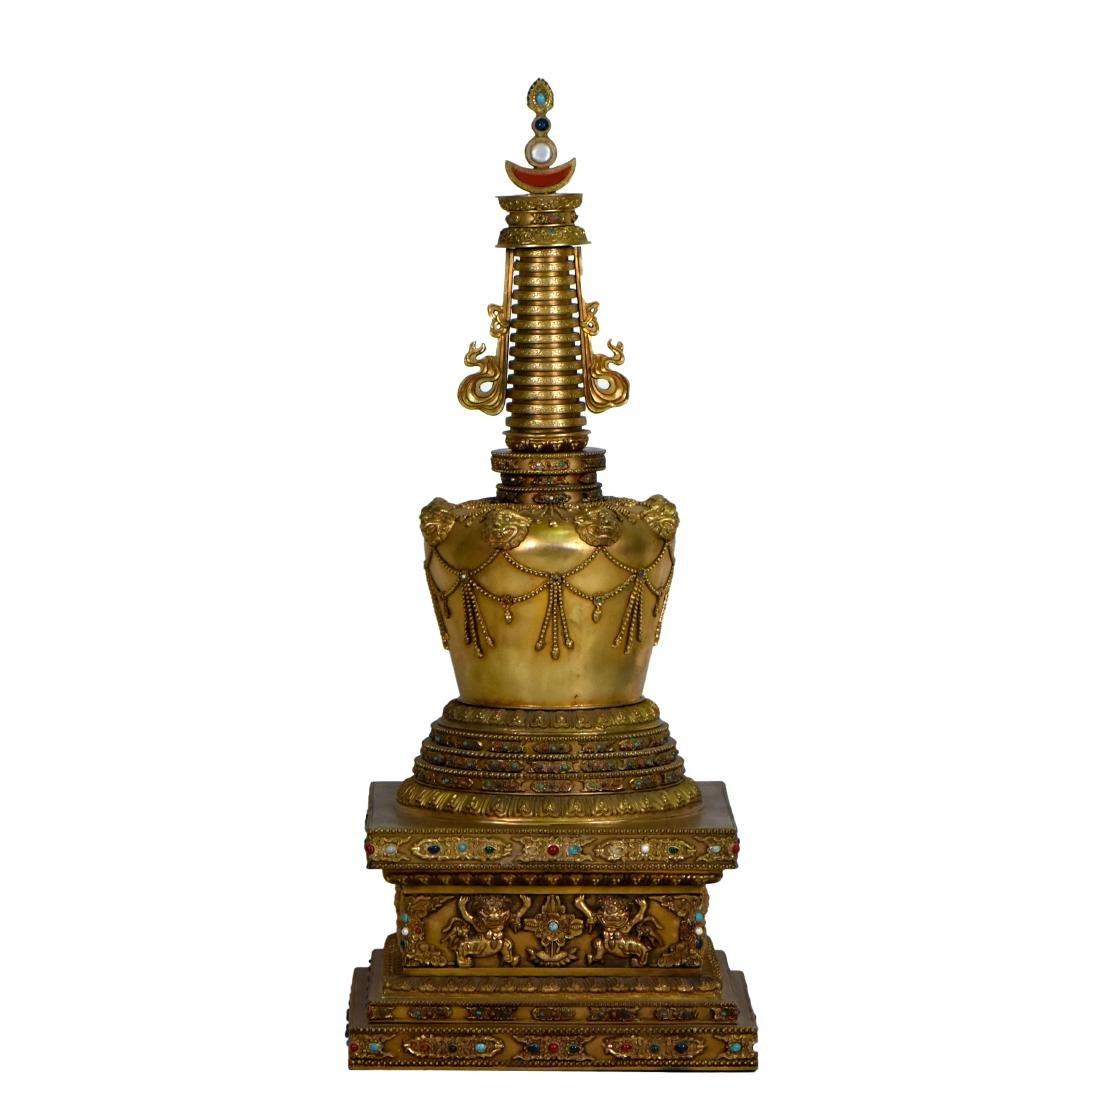 MASSIVE QING GILT BRONZE & STONES INLAID BUDDHA STUPA - 4